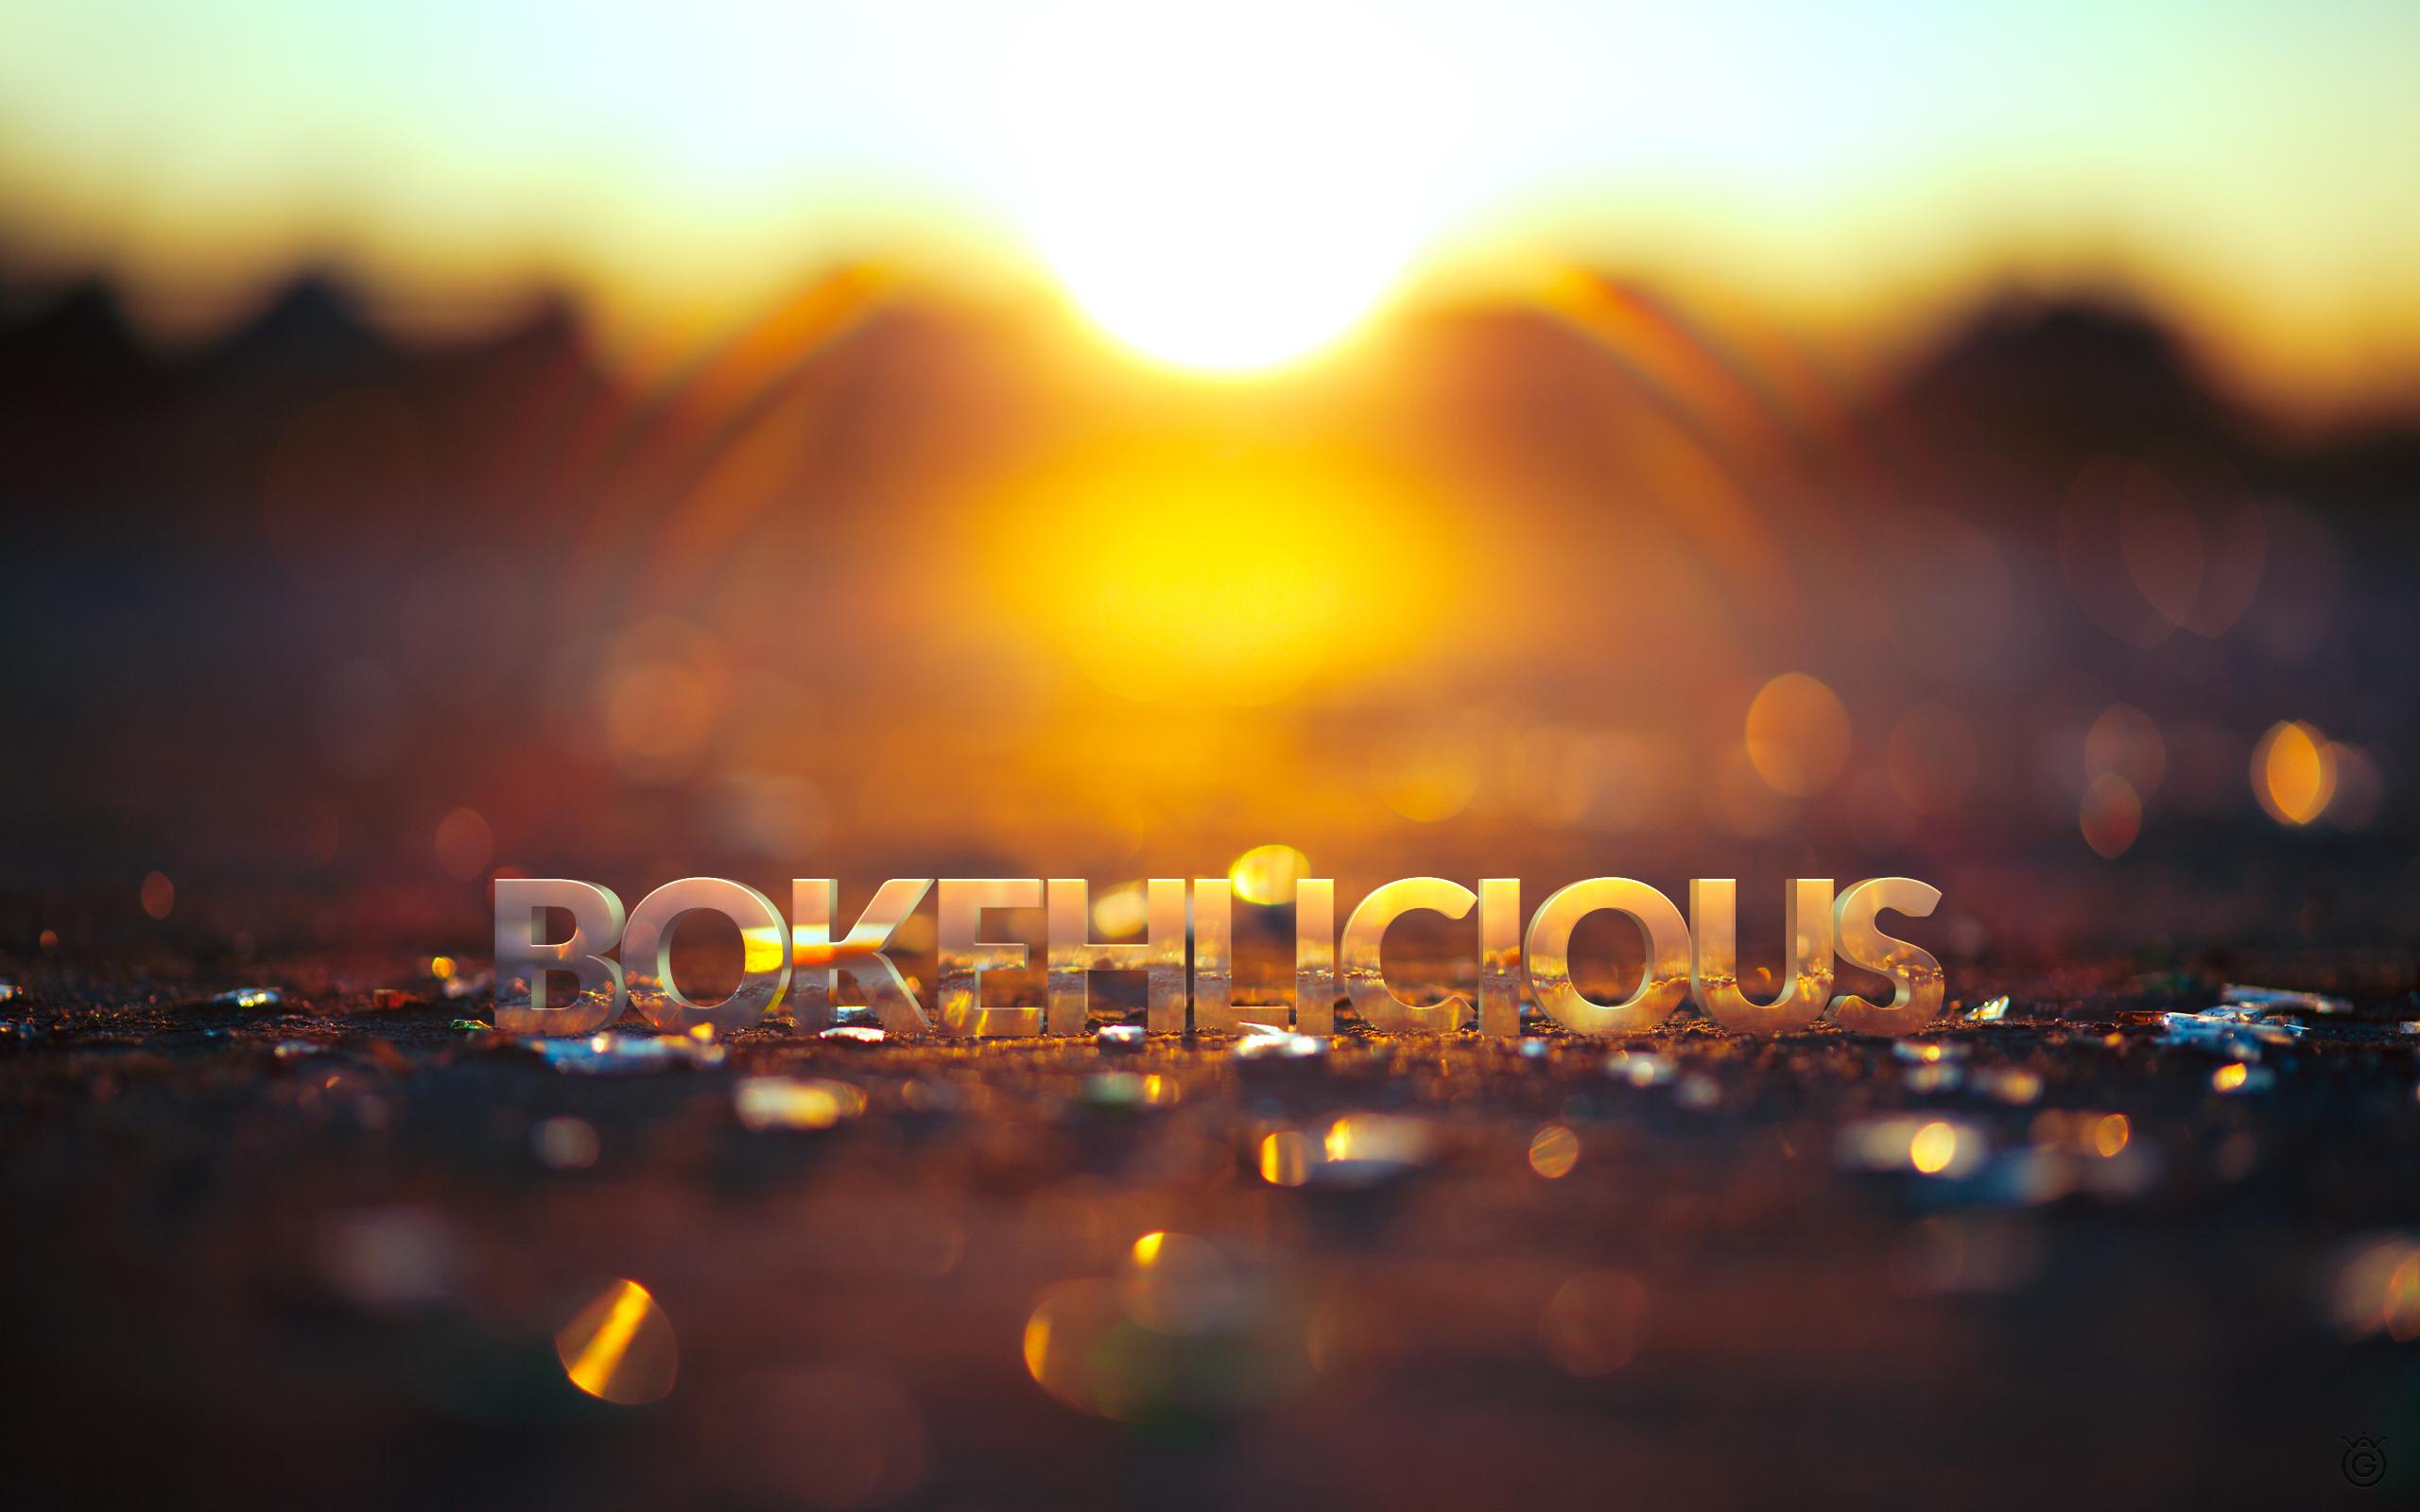 Bokehlicious - Wallpaper 2560x1600 by Wojciech Grzanka